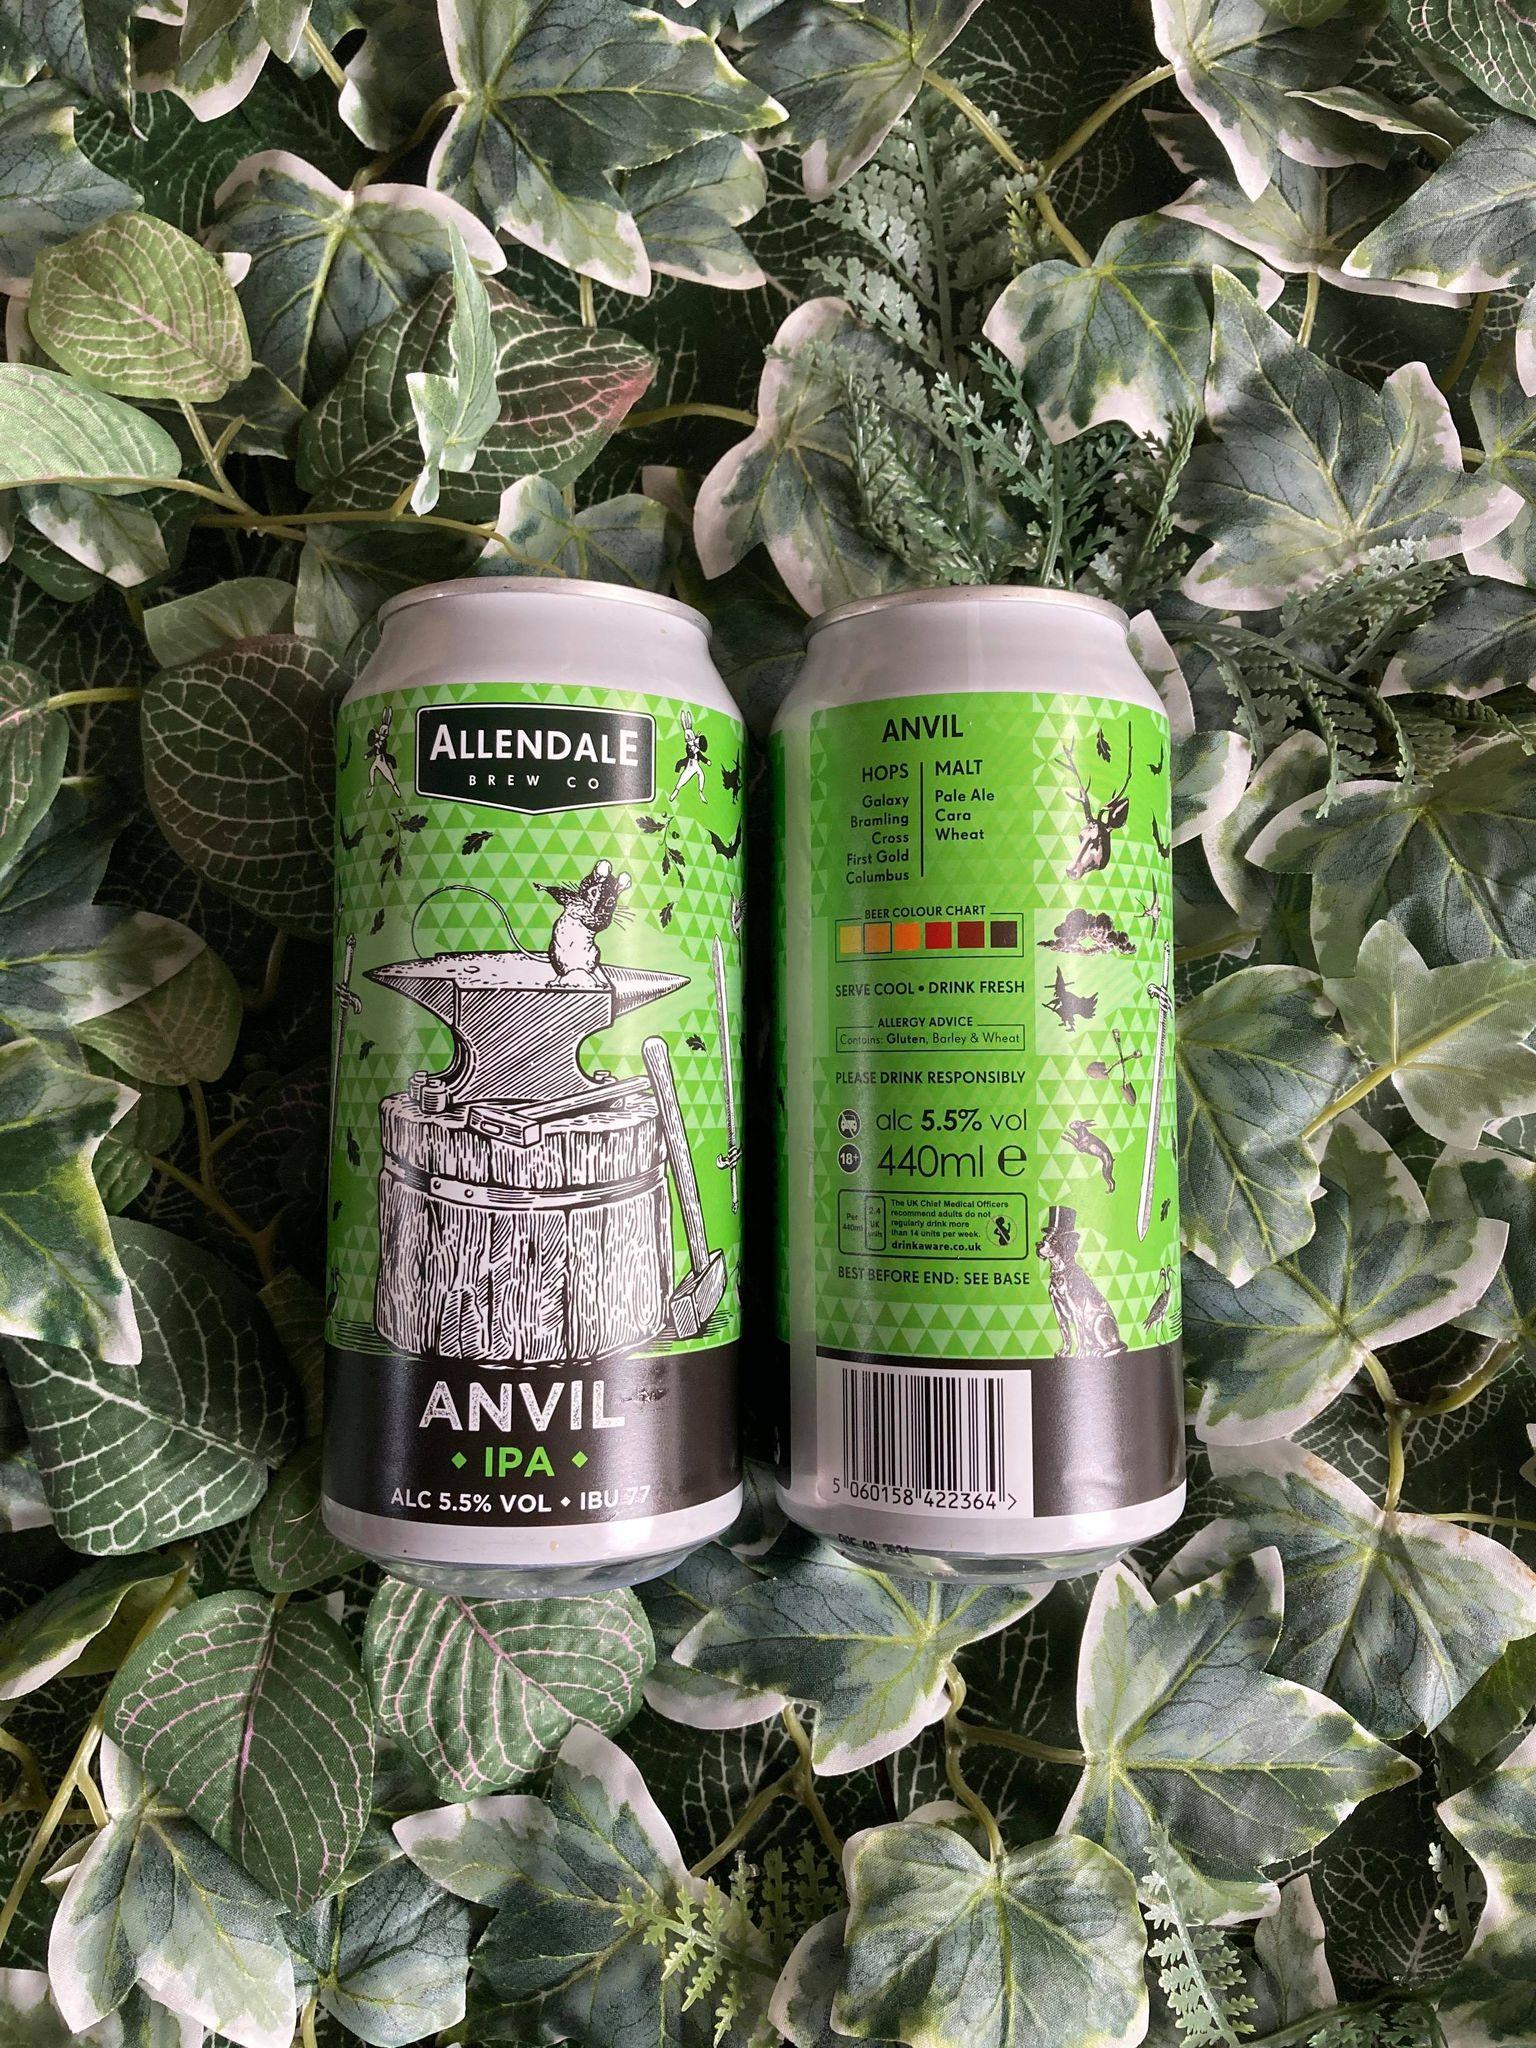 Allendale - Anvil 5.5%